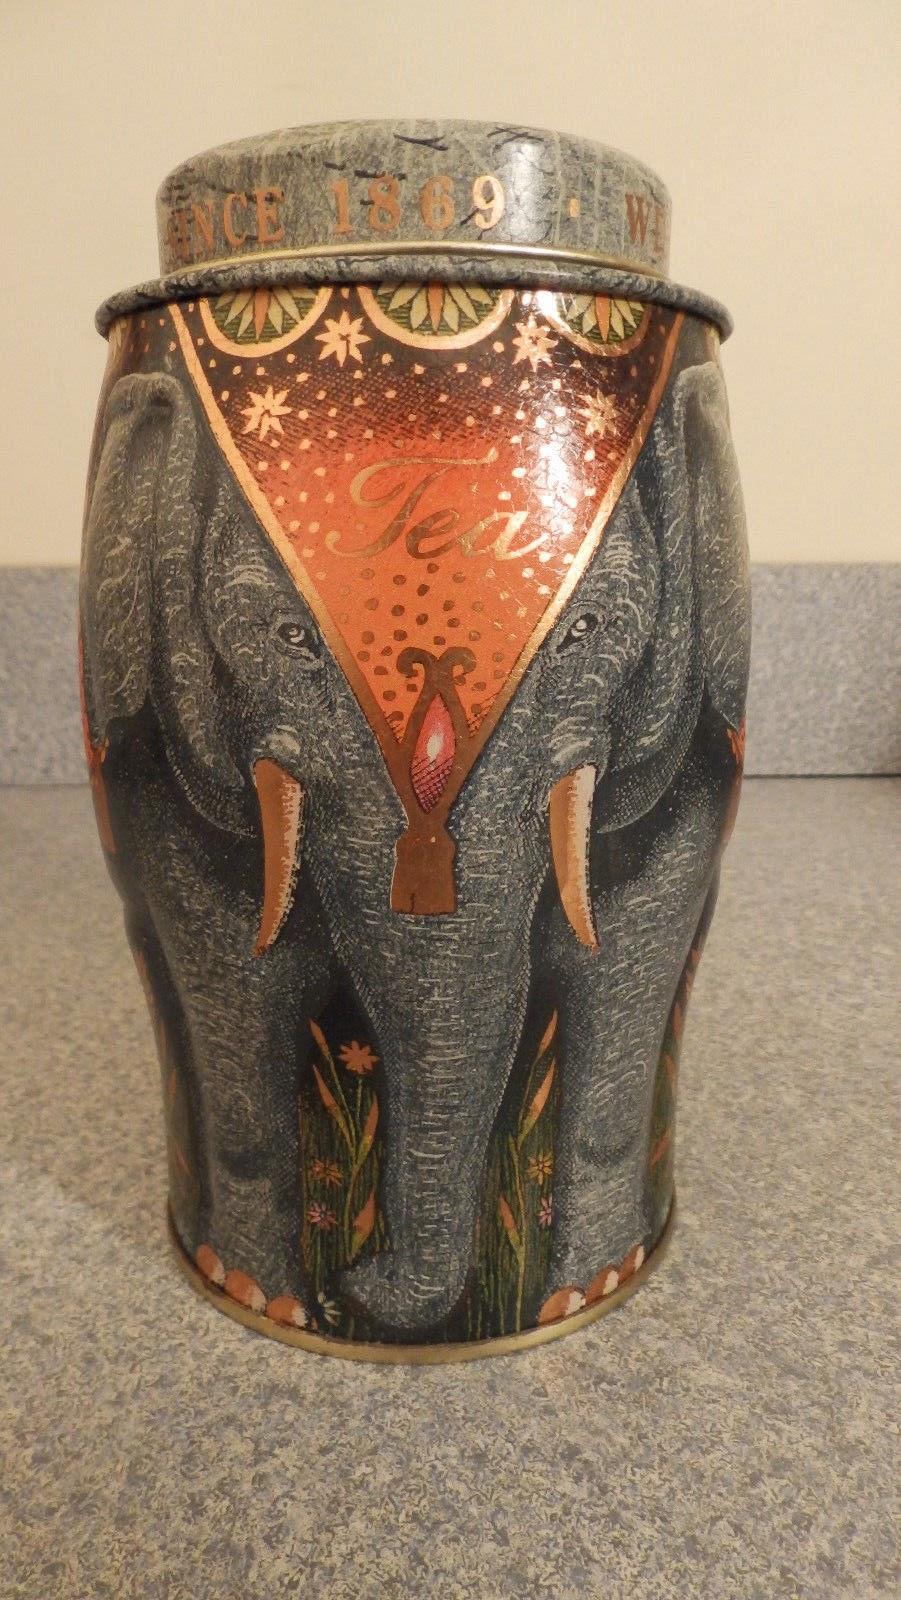 http://www.ebay.com/itm/Magor-Blue-Elephant-Williamson-Magor-Fine-Teas-Since-1869-Tea-Tin-/321689573619?pt=LH_DefaultDomain_0&hash=item4ae63158f3